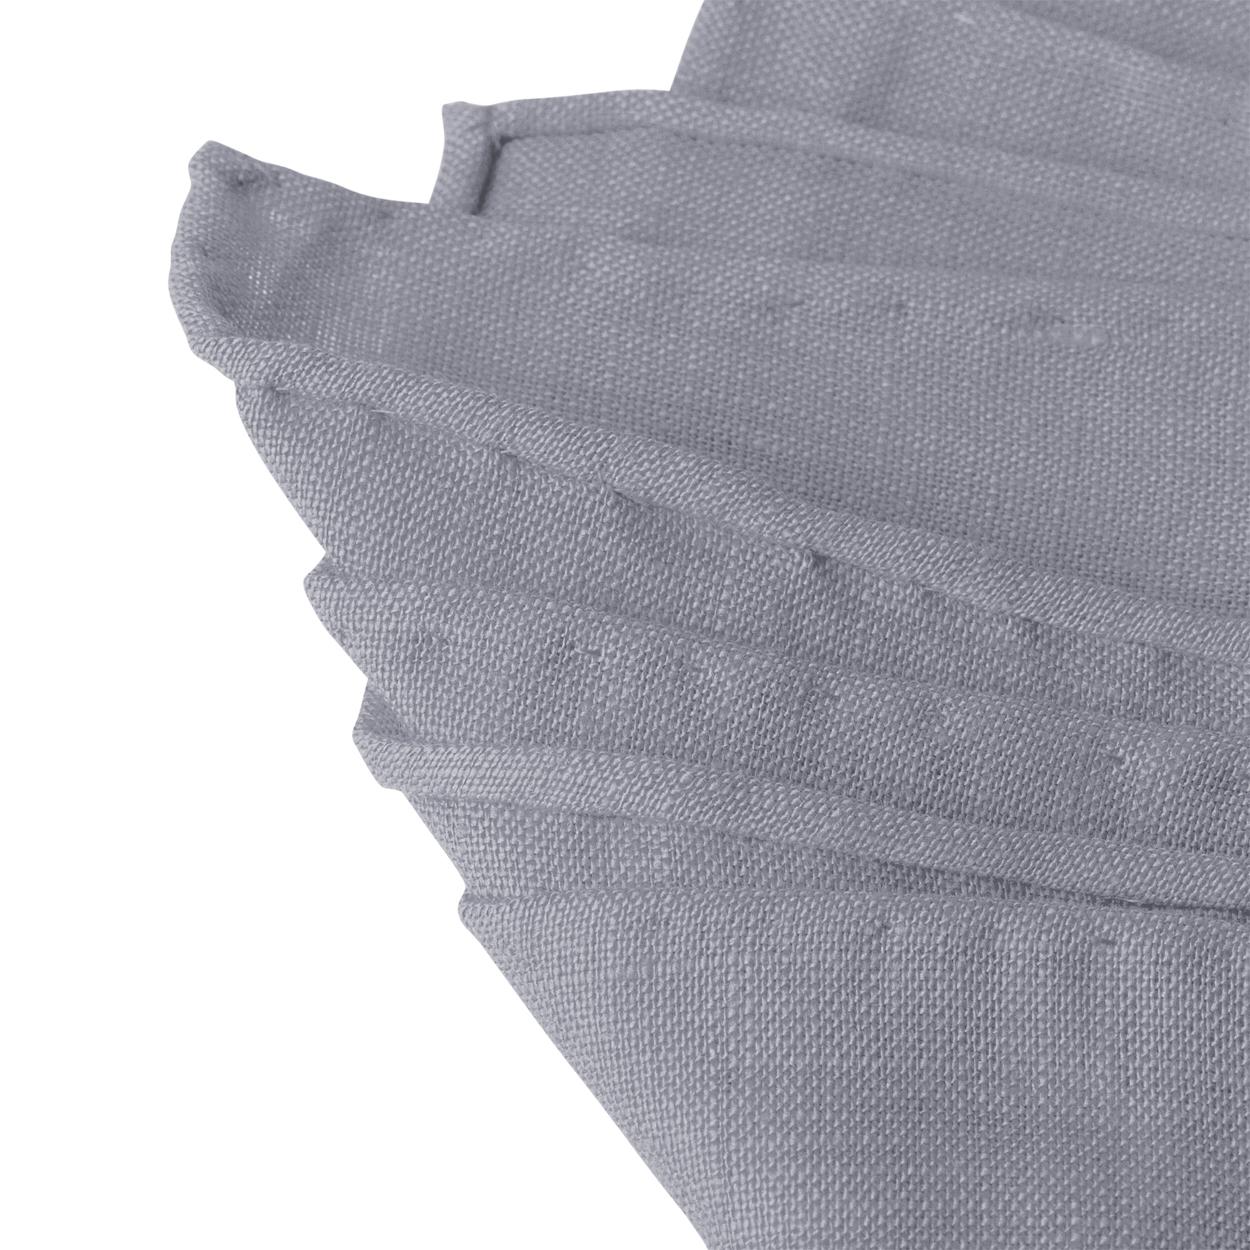 Jacob-Alexander-Linen-Handrolled-15-034-x-15-034-Pocket-Square-Hanky thumbnail 29